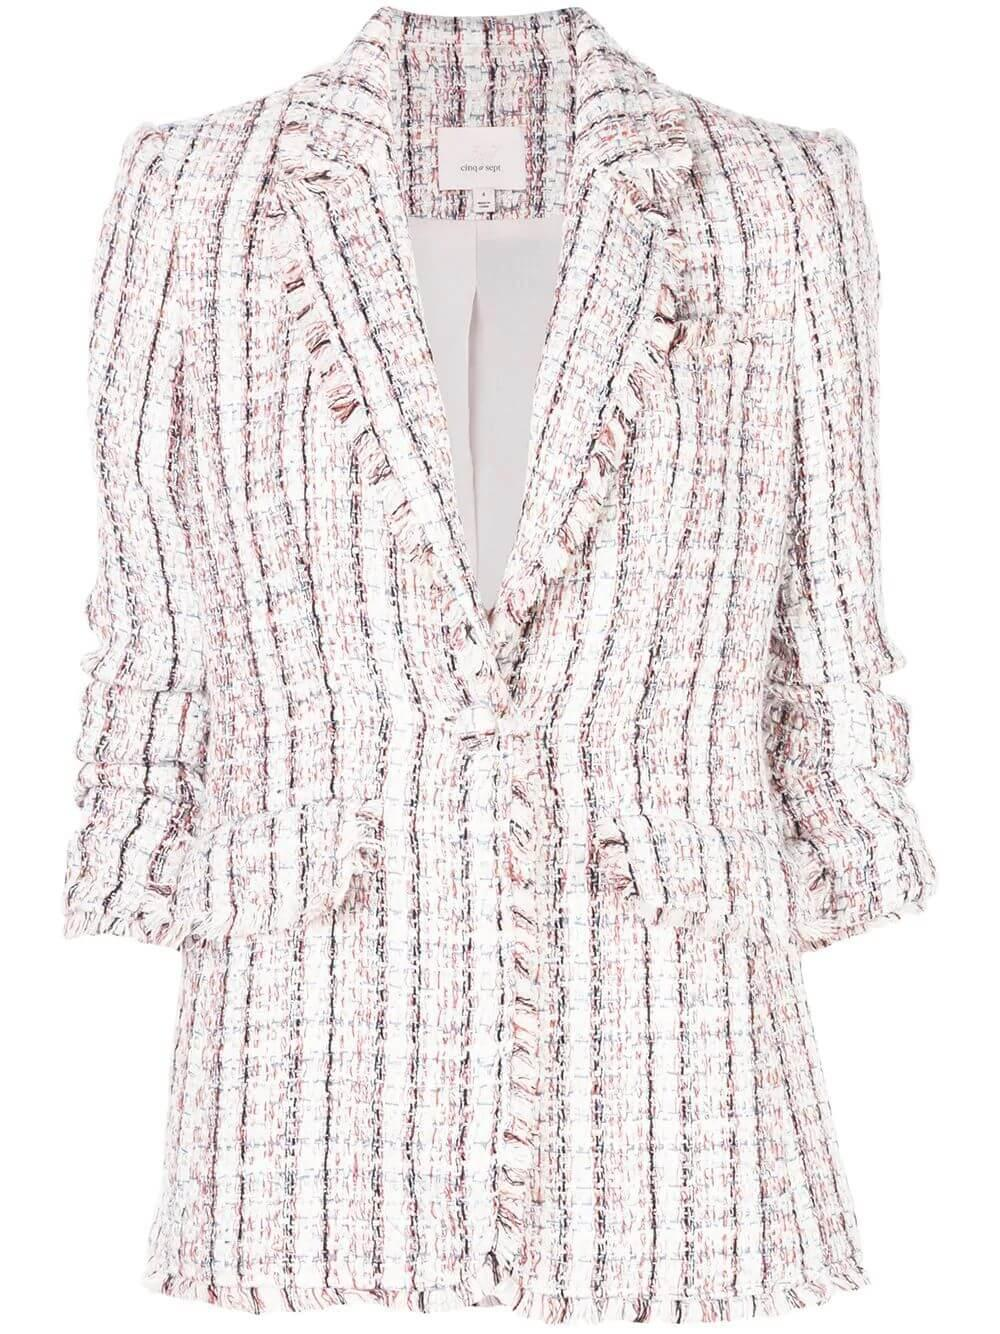 Boucle Khloe Tweed Blazer